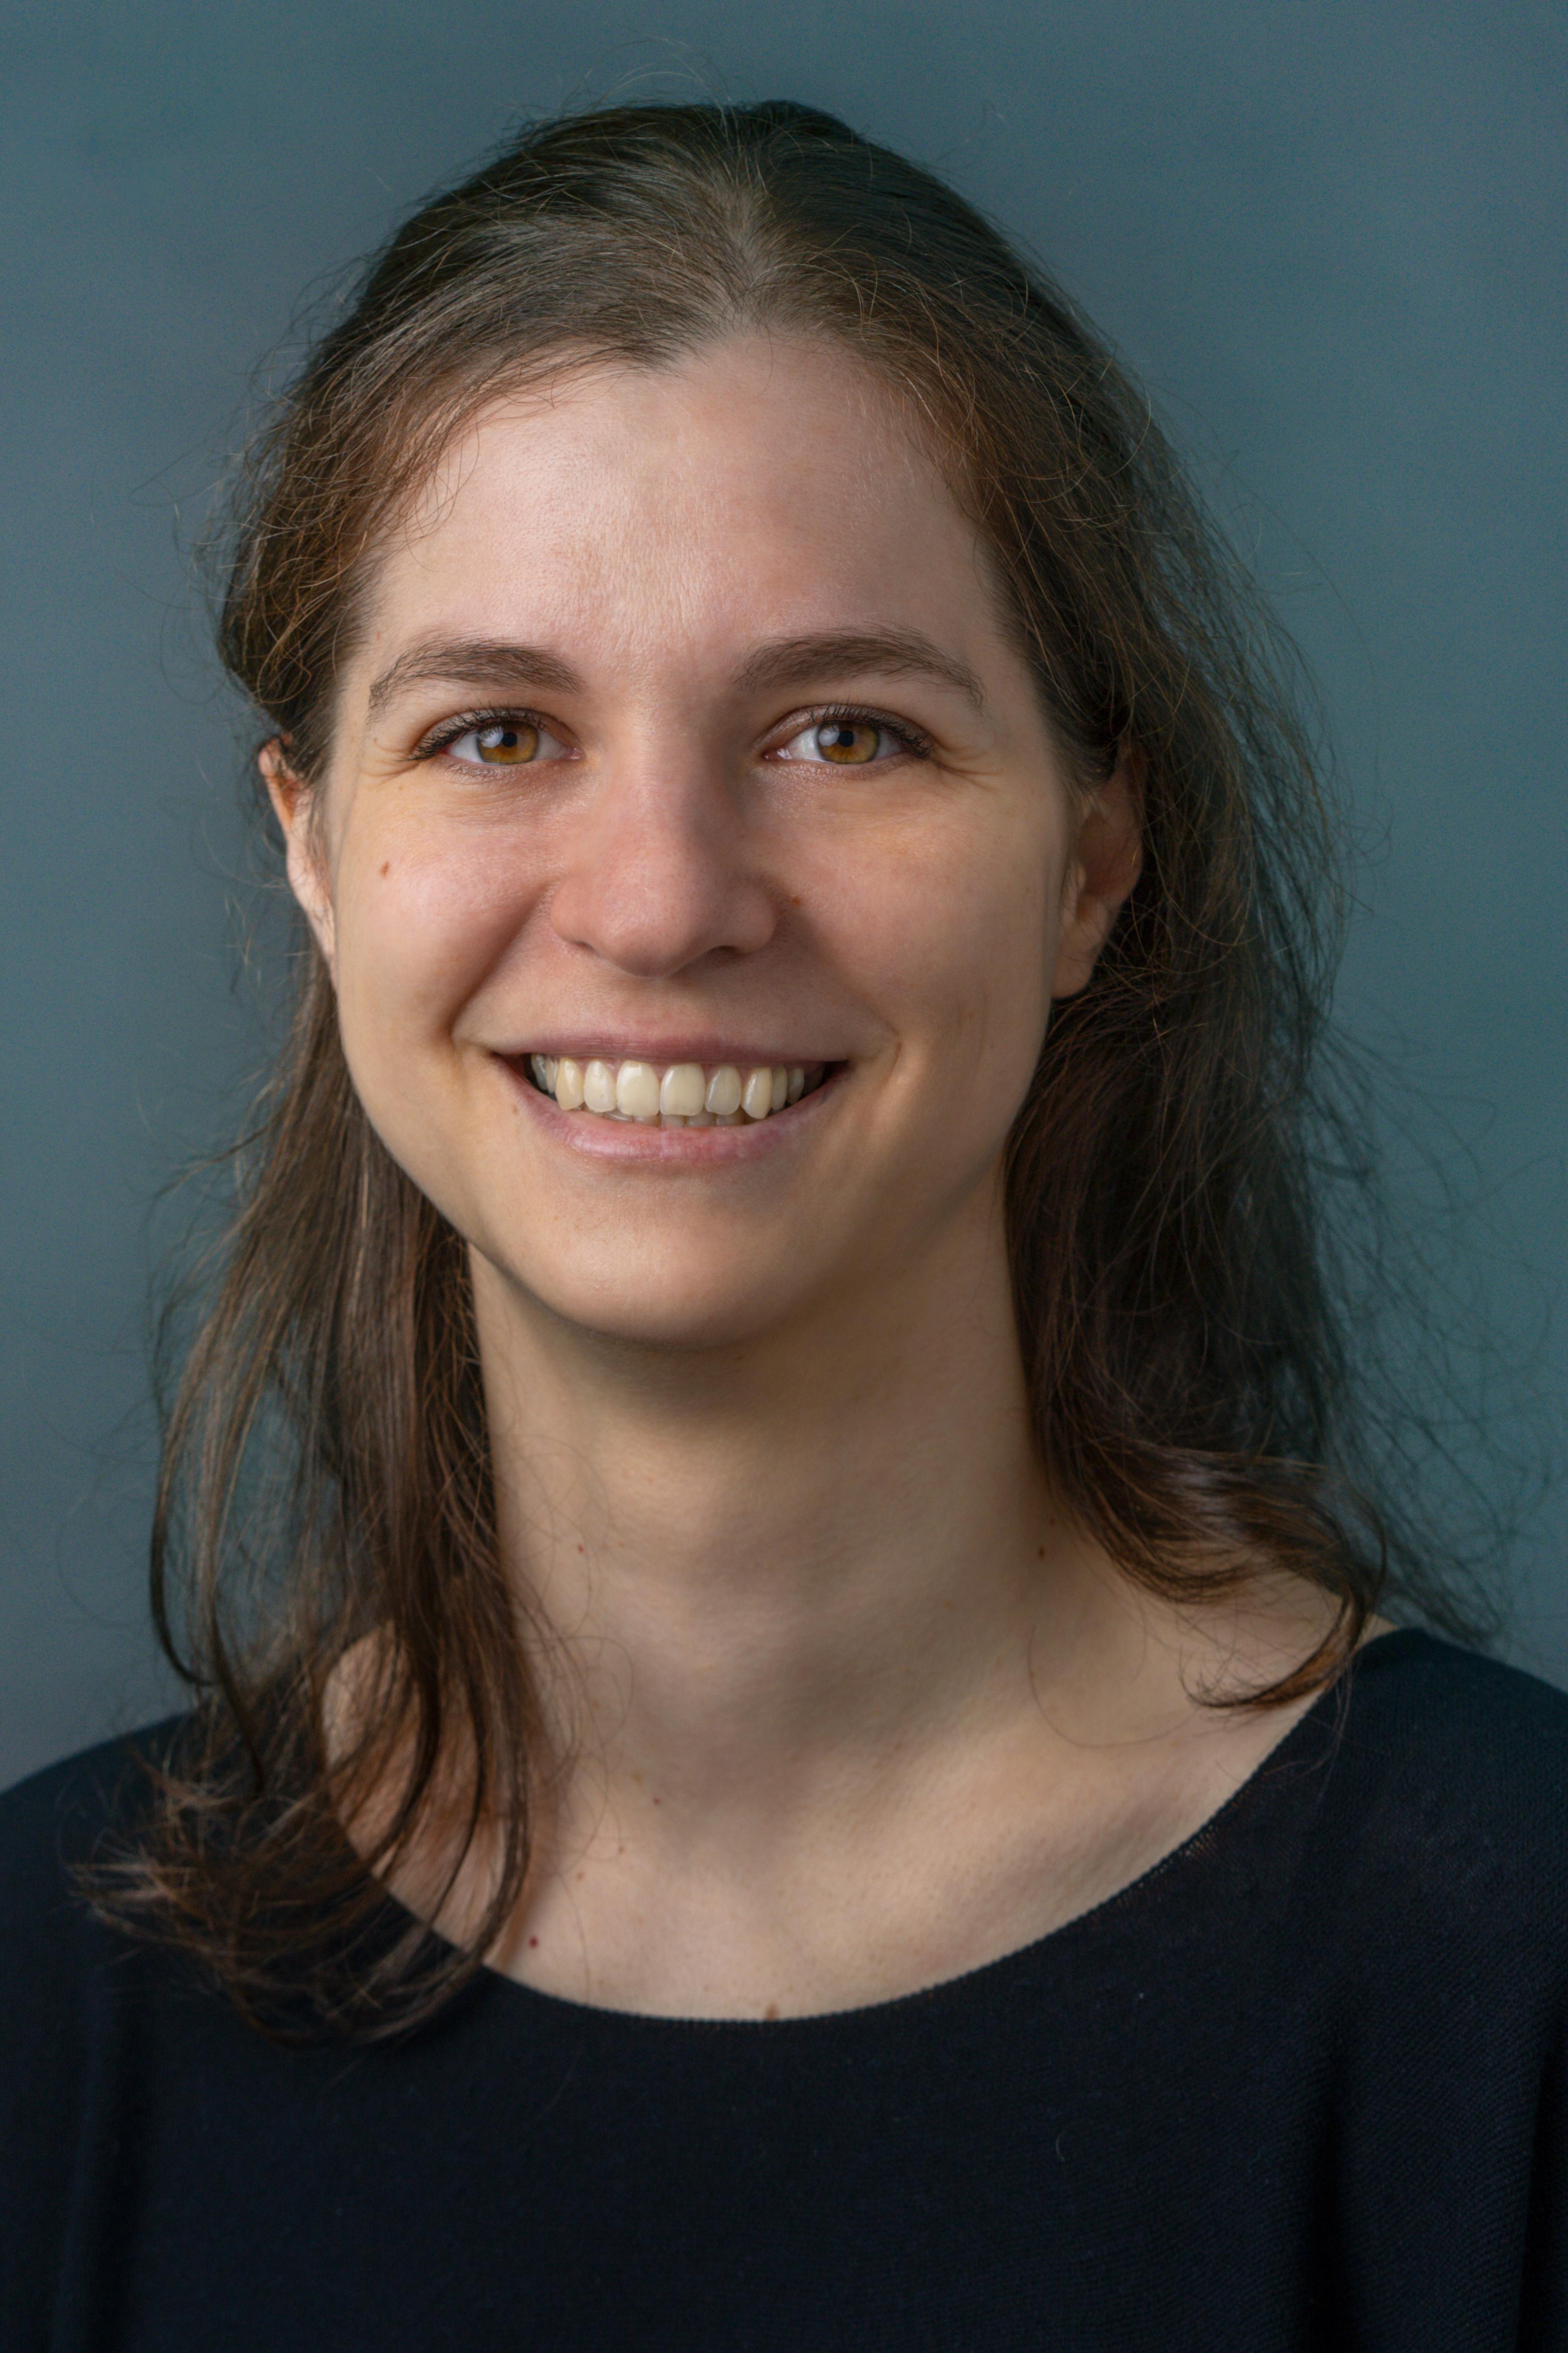 Sarah Zauner